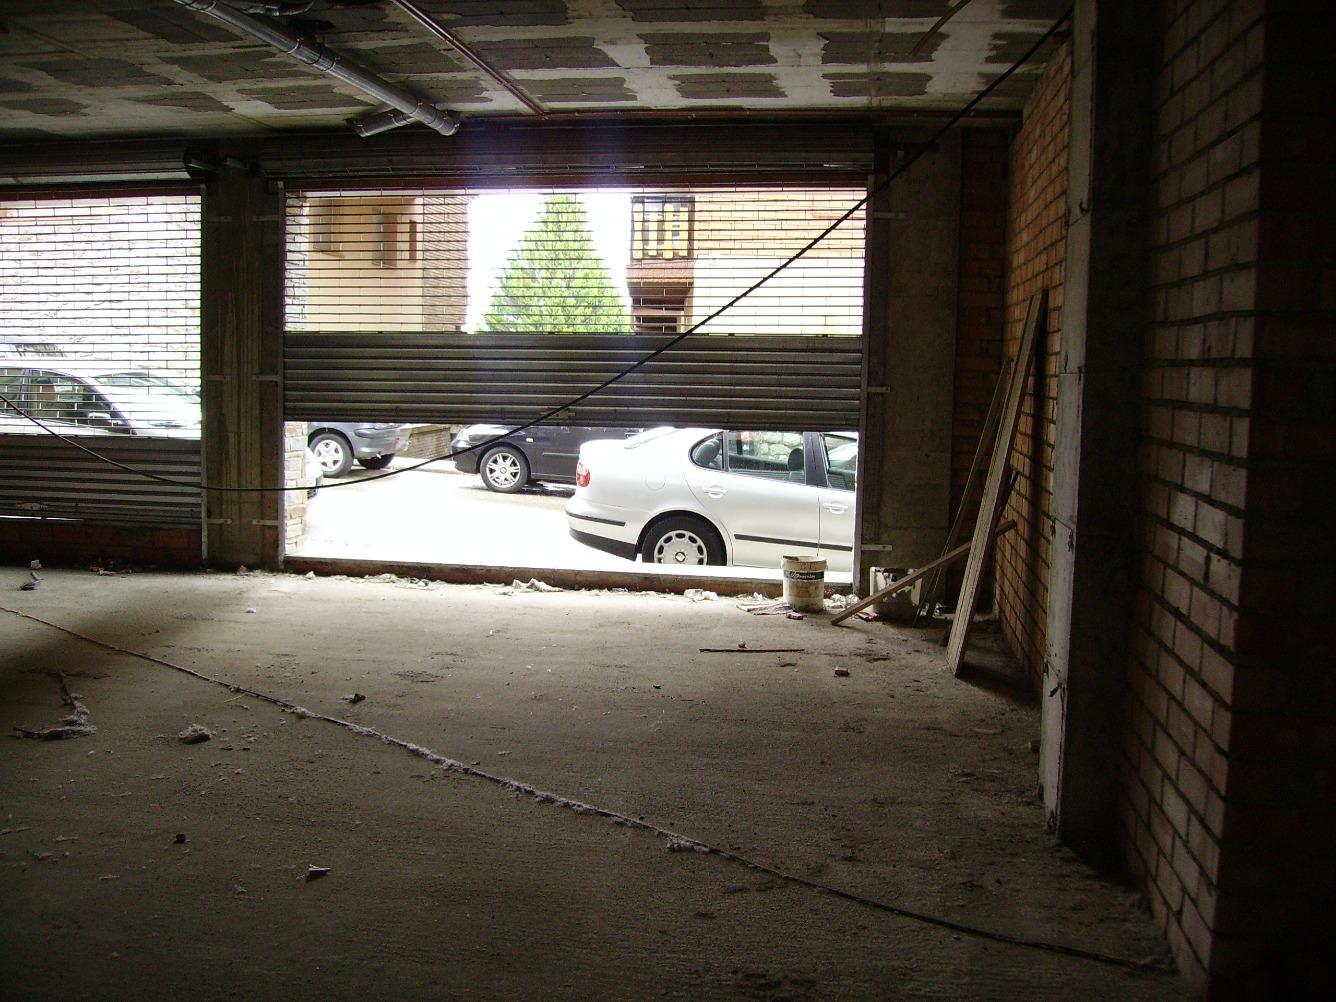 Affitto Locale commerciale  Calle antiga duana, 1. 88 m2 totales , divisible en dos locales de 44 m2 cada uno con d